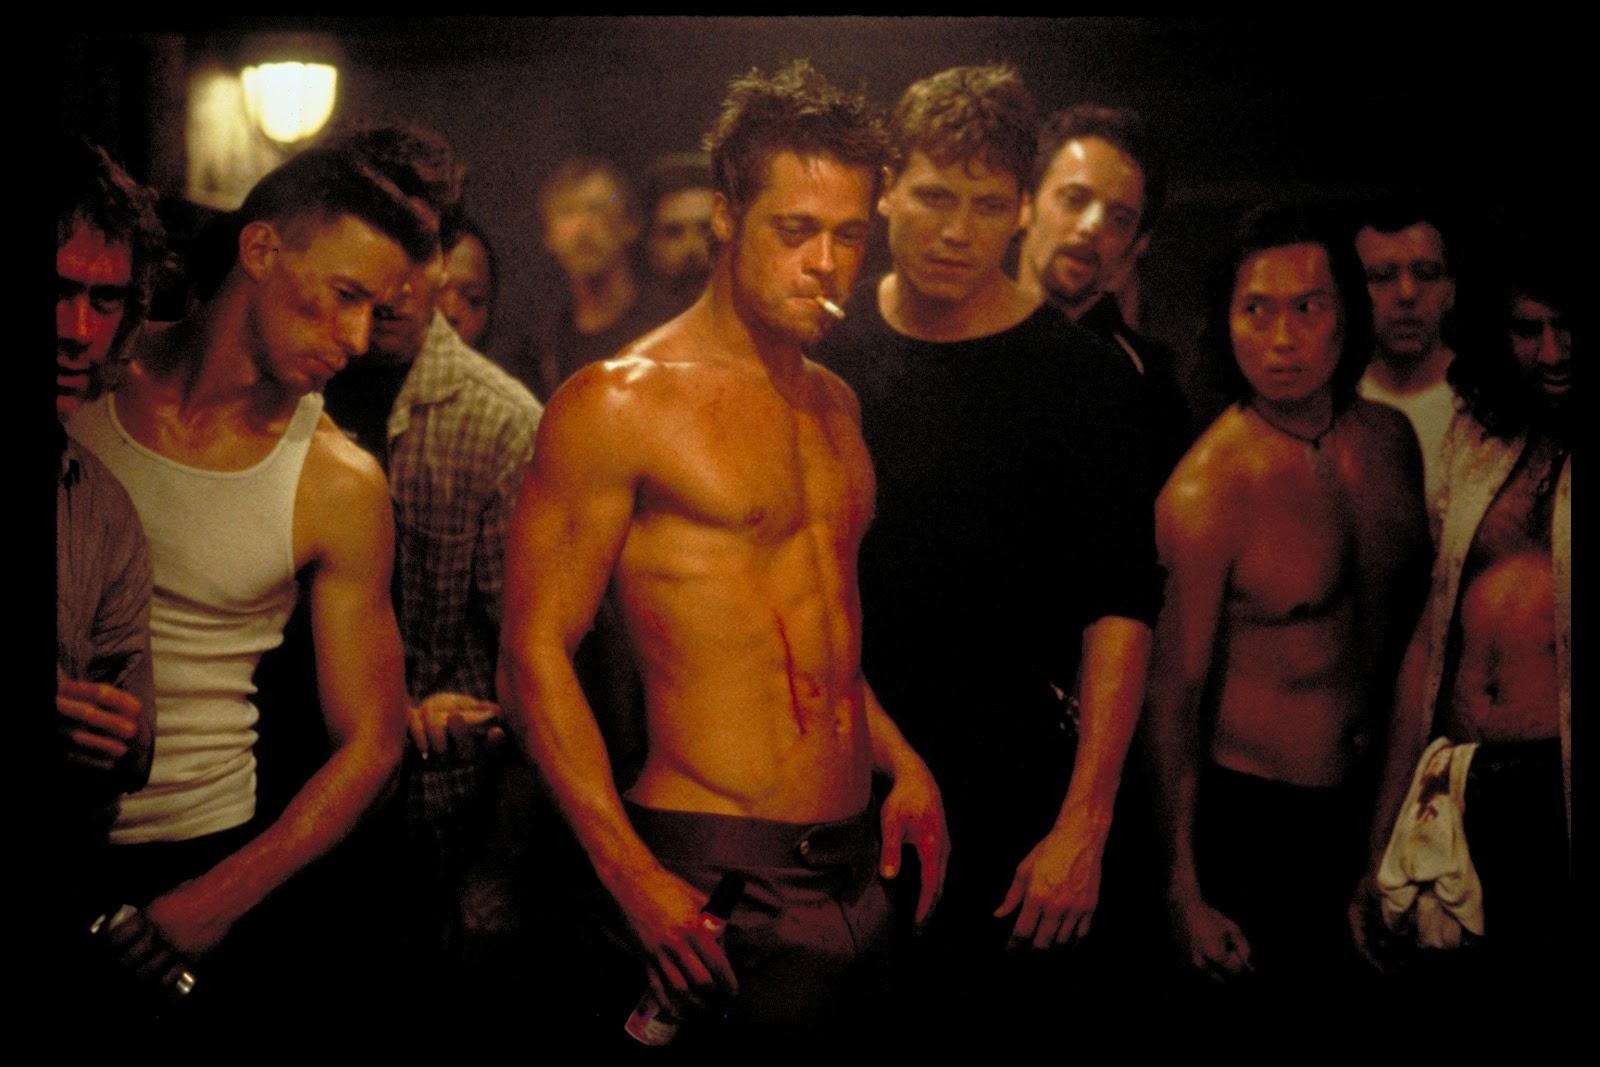 http://3.bp.blogspot.com/-vVSuQckYpfg/T8kyCLdO9GI/AAAAAAAAT7o/ek7KsPVuHvk/s1600/fight_club_4578.jpg